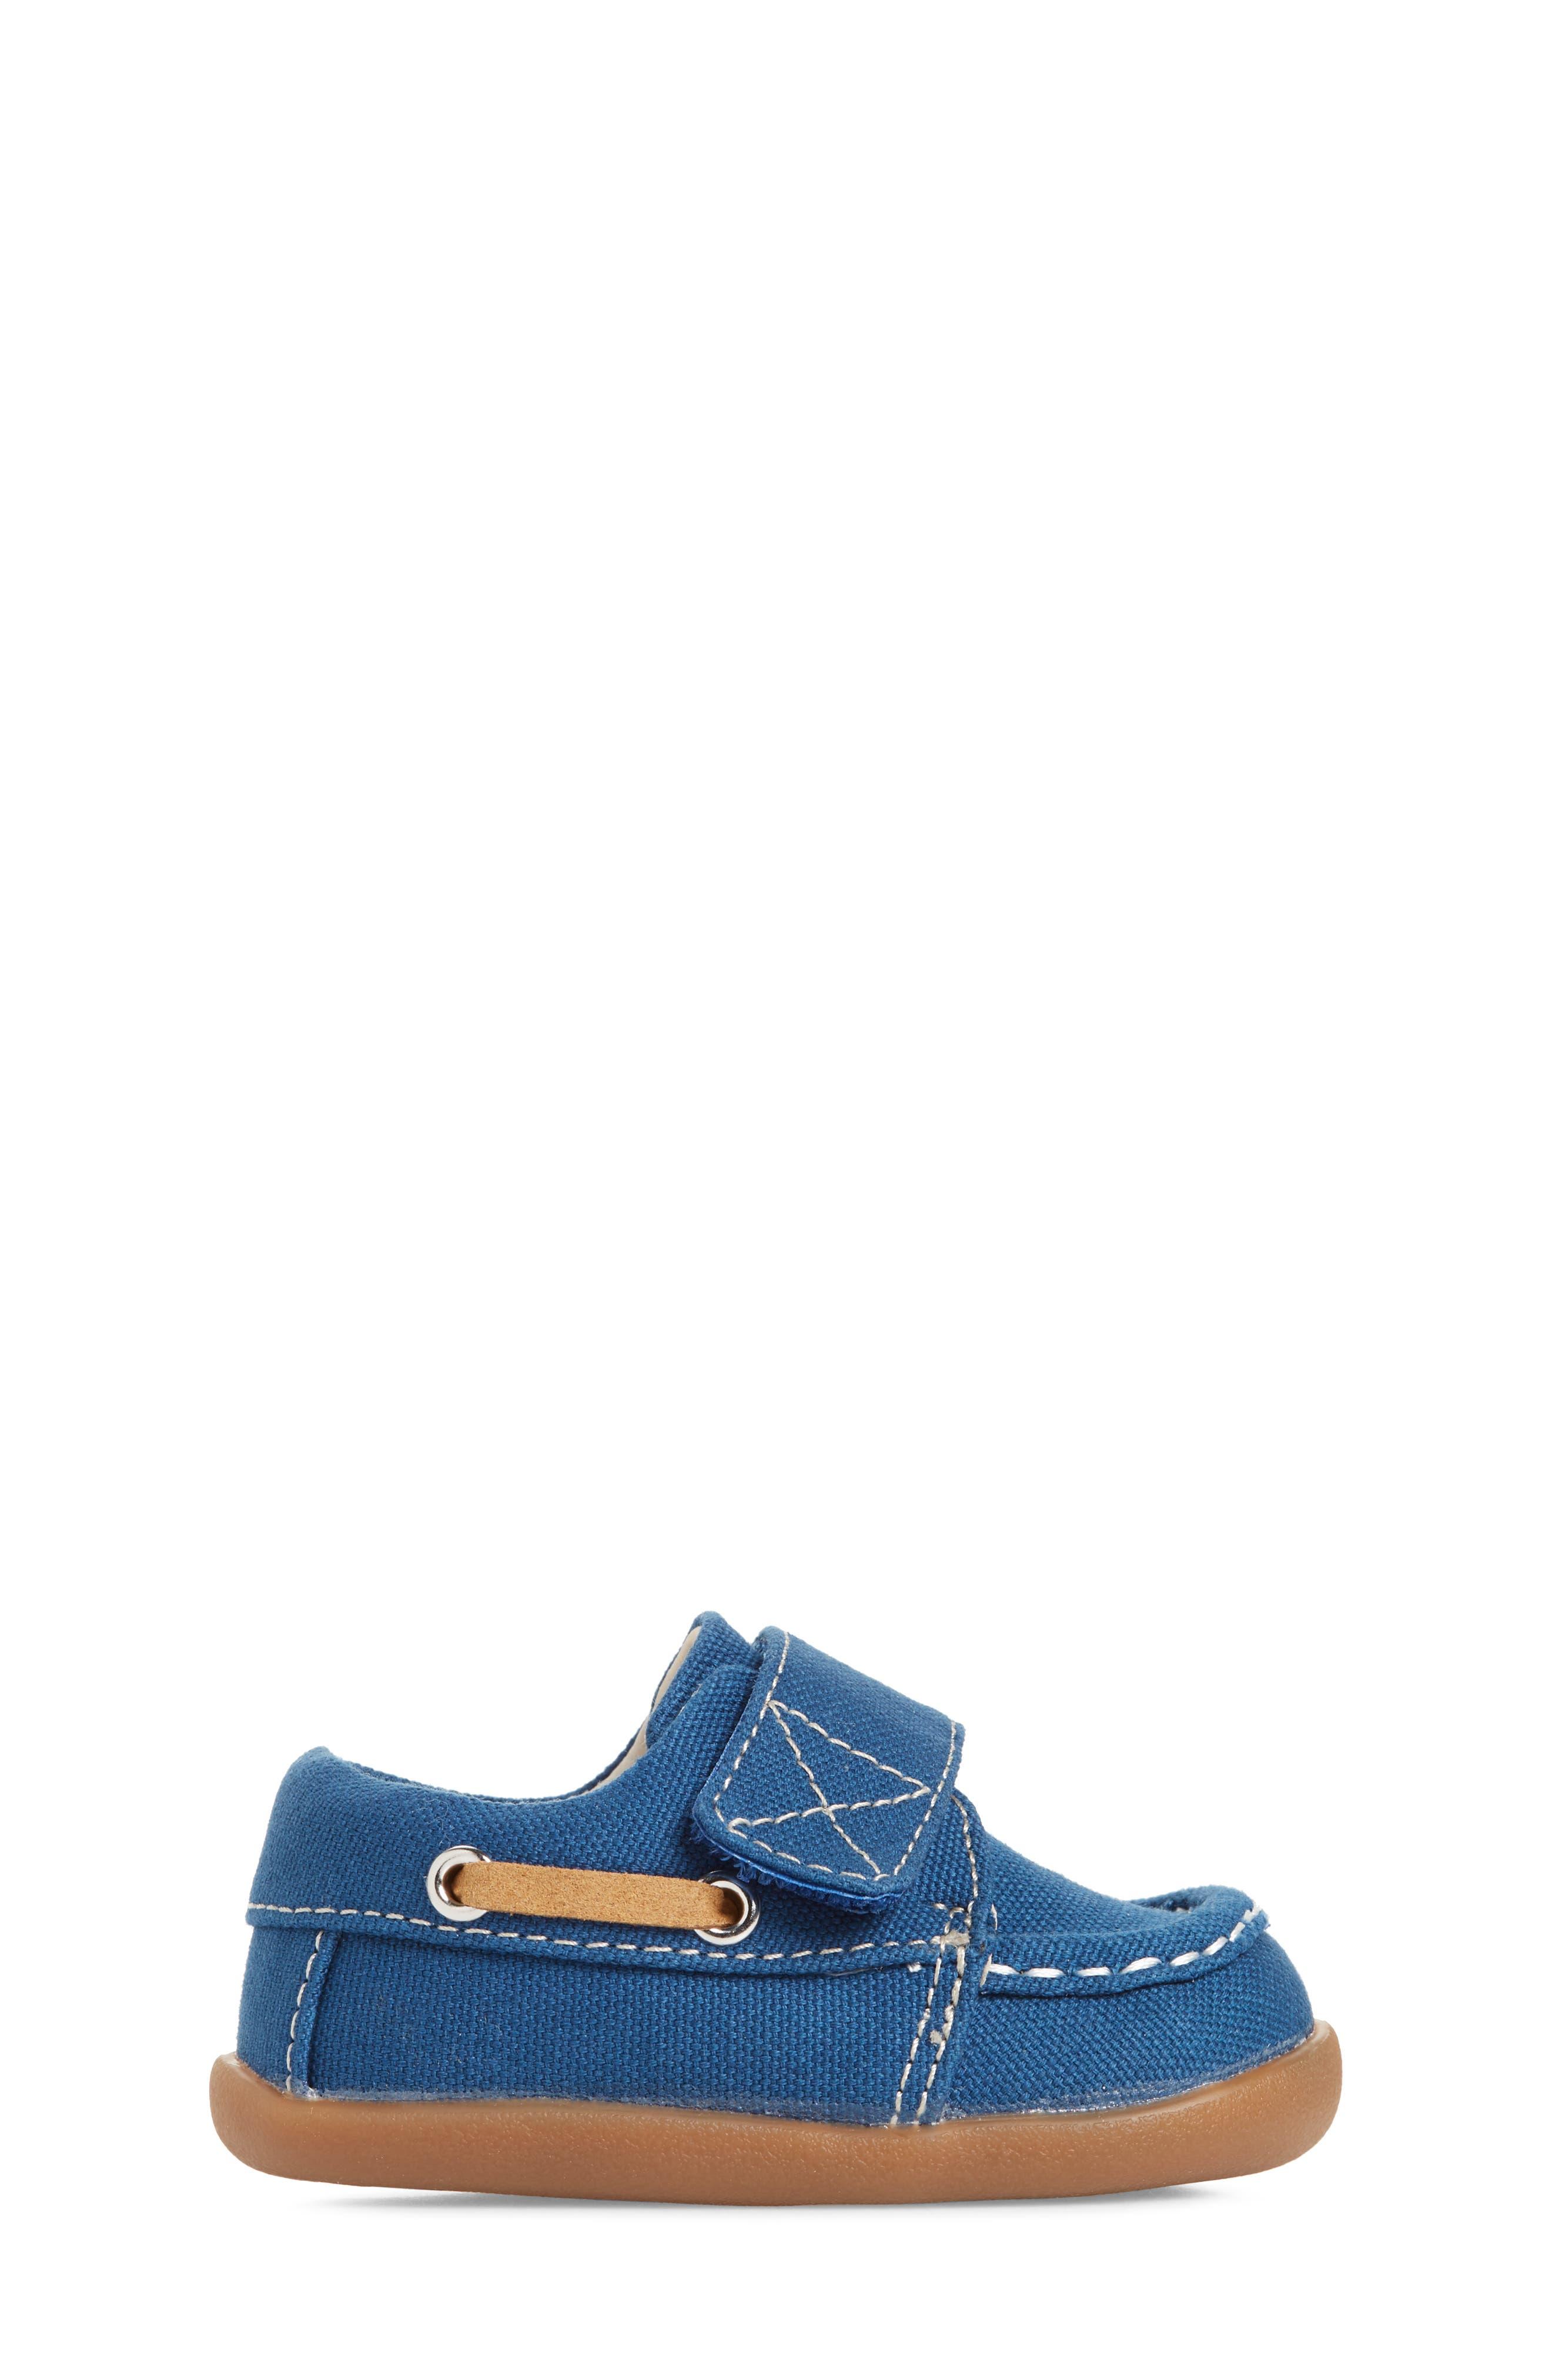 Arthur Sneaker,                             Alternate thumbnail 3, color,                             BLUE CANVAS